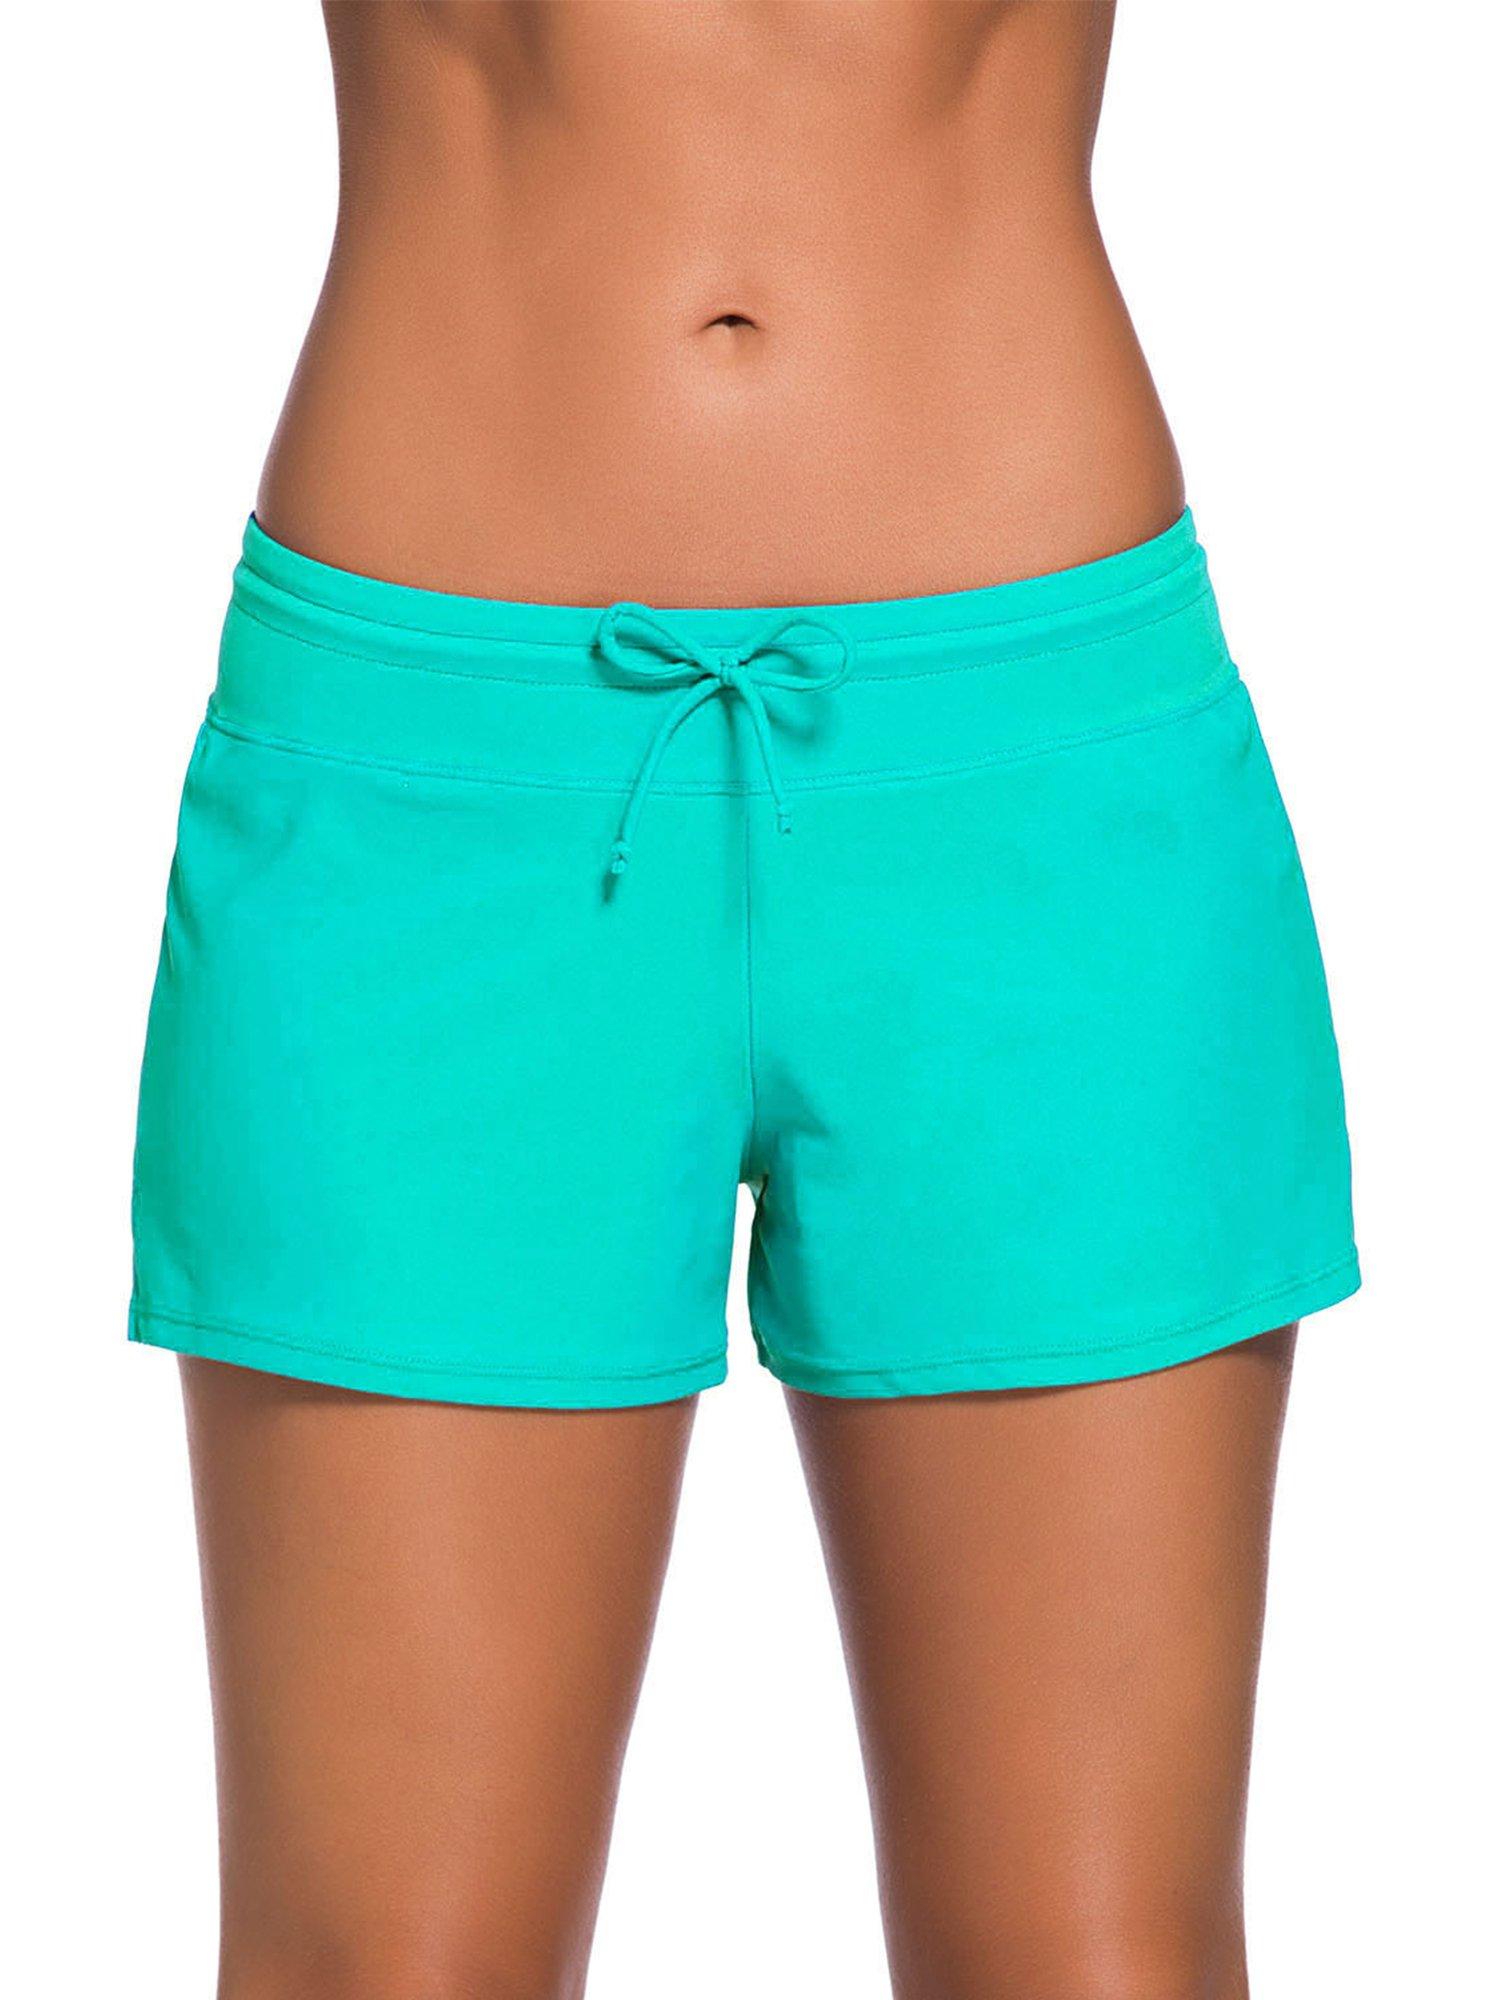 Satinior Women Swimsuit Shorts Tankini Swim Briefs Side Split Plus Size Bottom Boardshort Summer Beach Swimwear Trunks (M Size, Green)